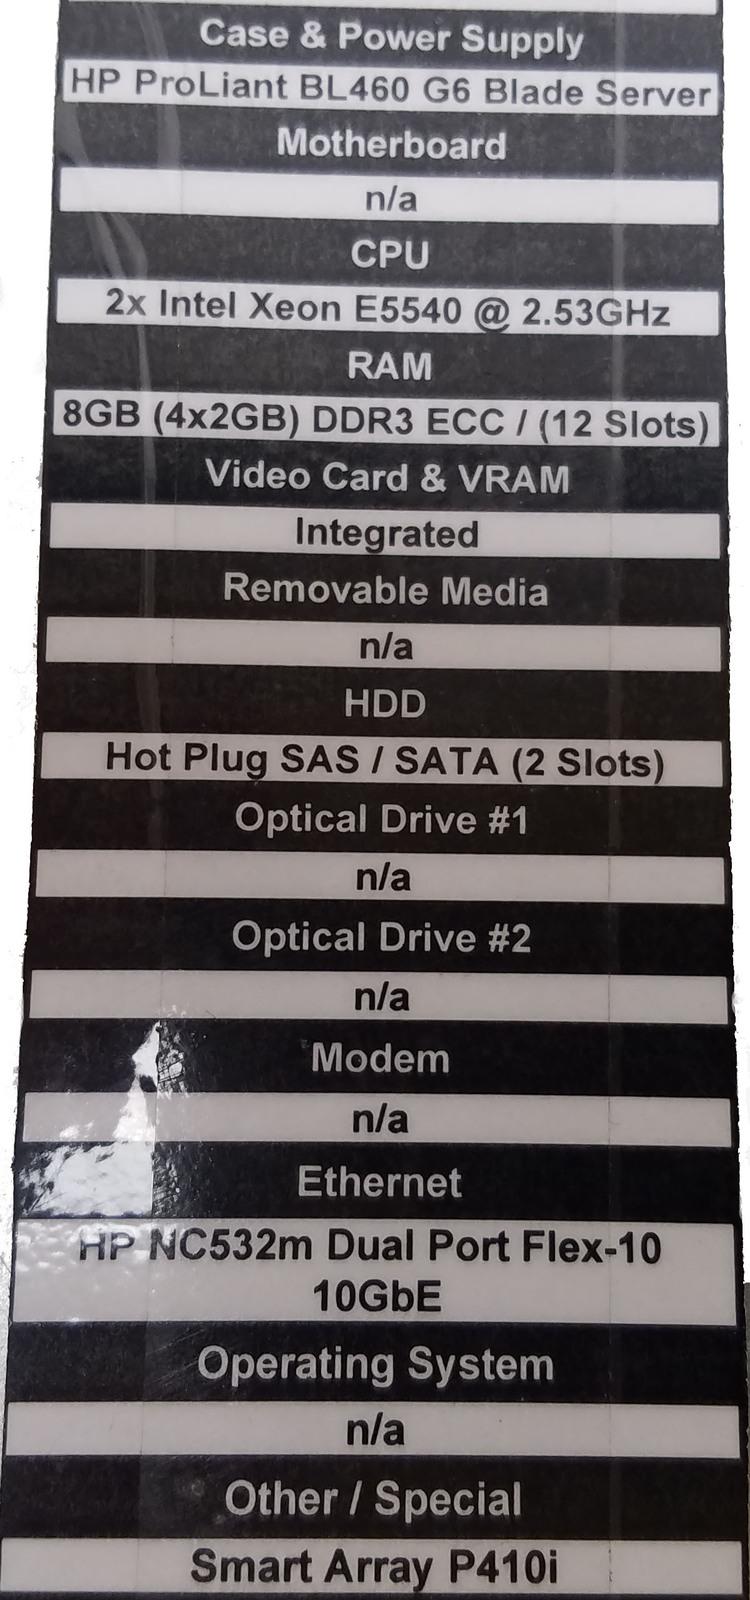 HP ProLiant BL460 G6 Blade Server With 2x Xeon (No HDD) Bin:1